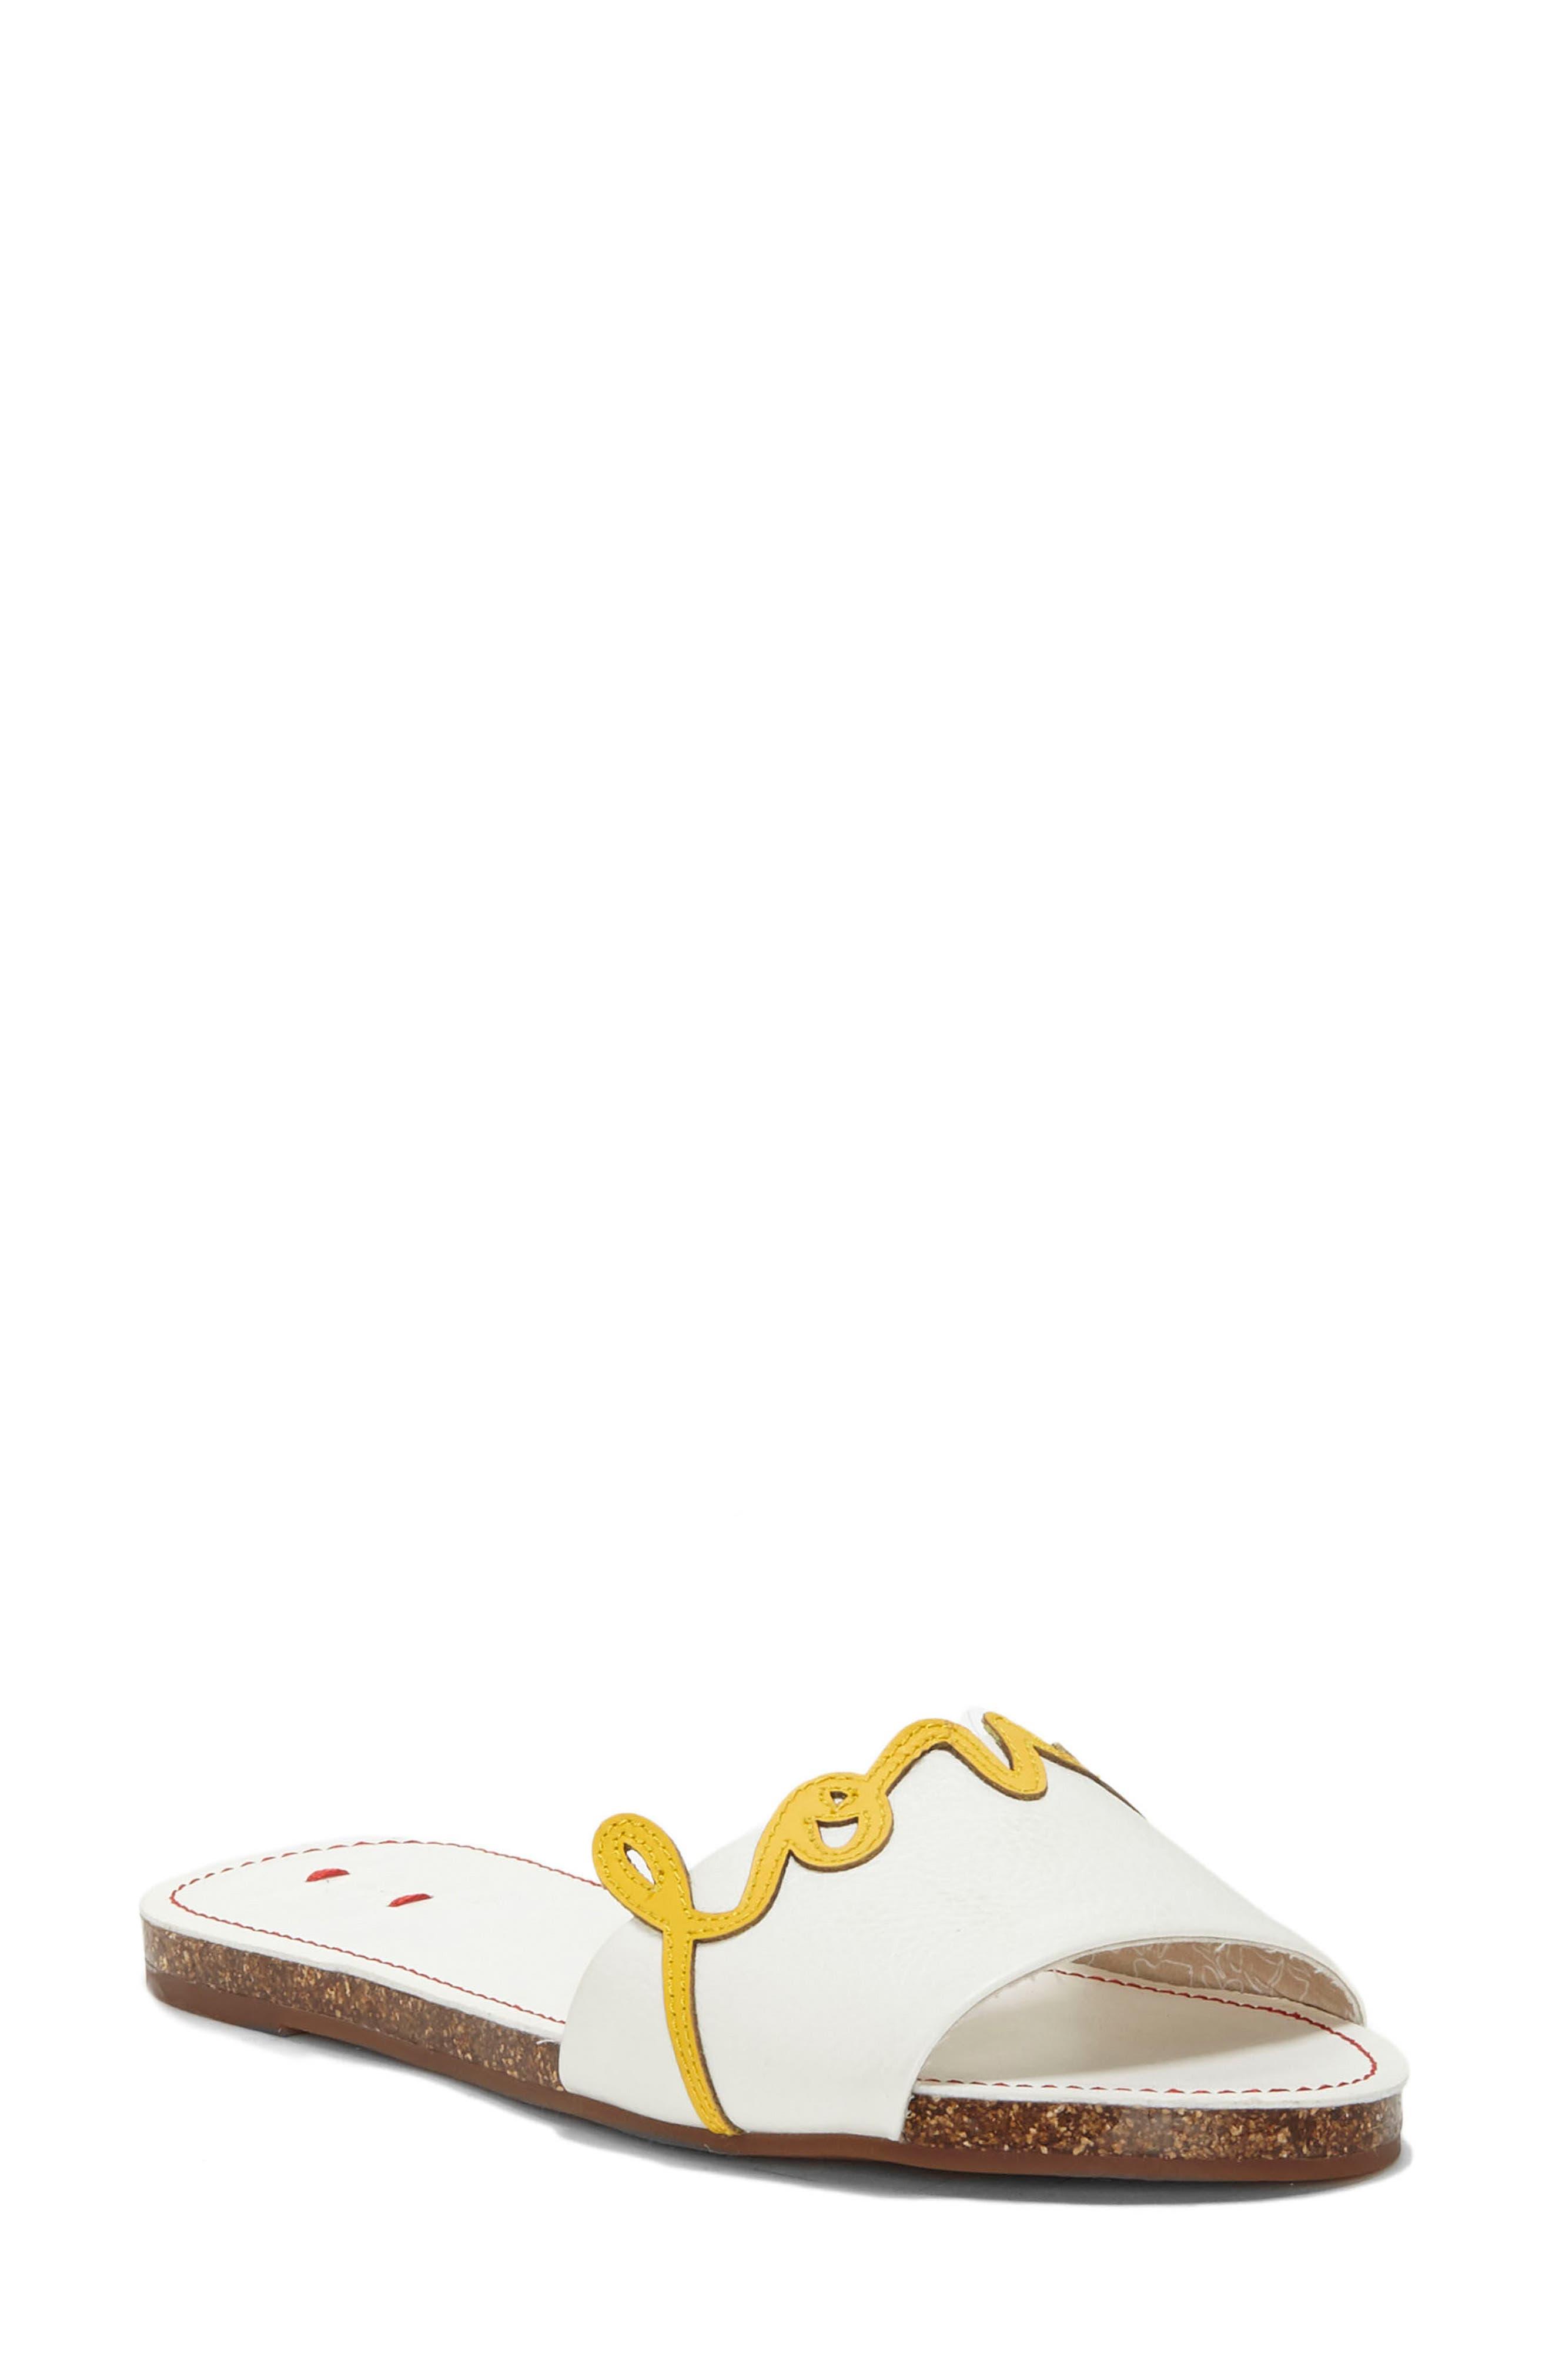 Sharlin Slide Sandal,                             Main thumbnail 1, color,                             110